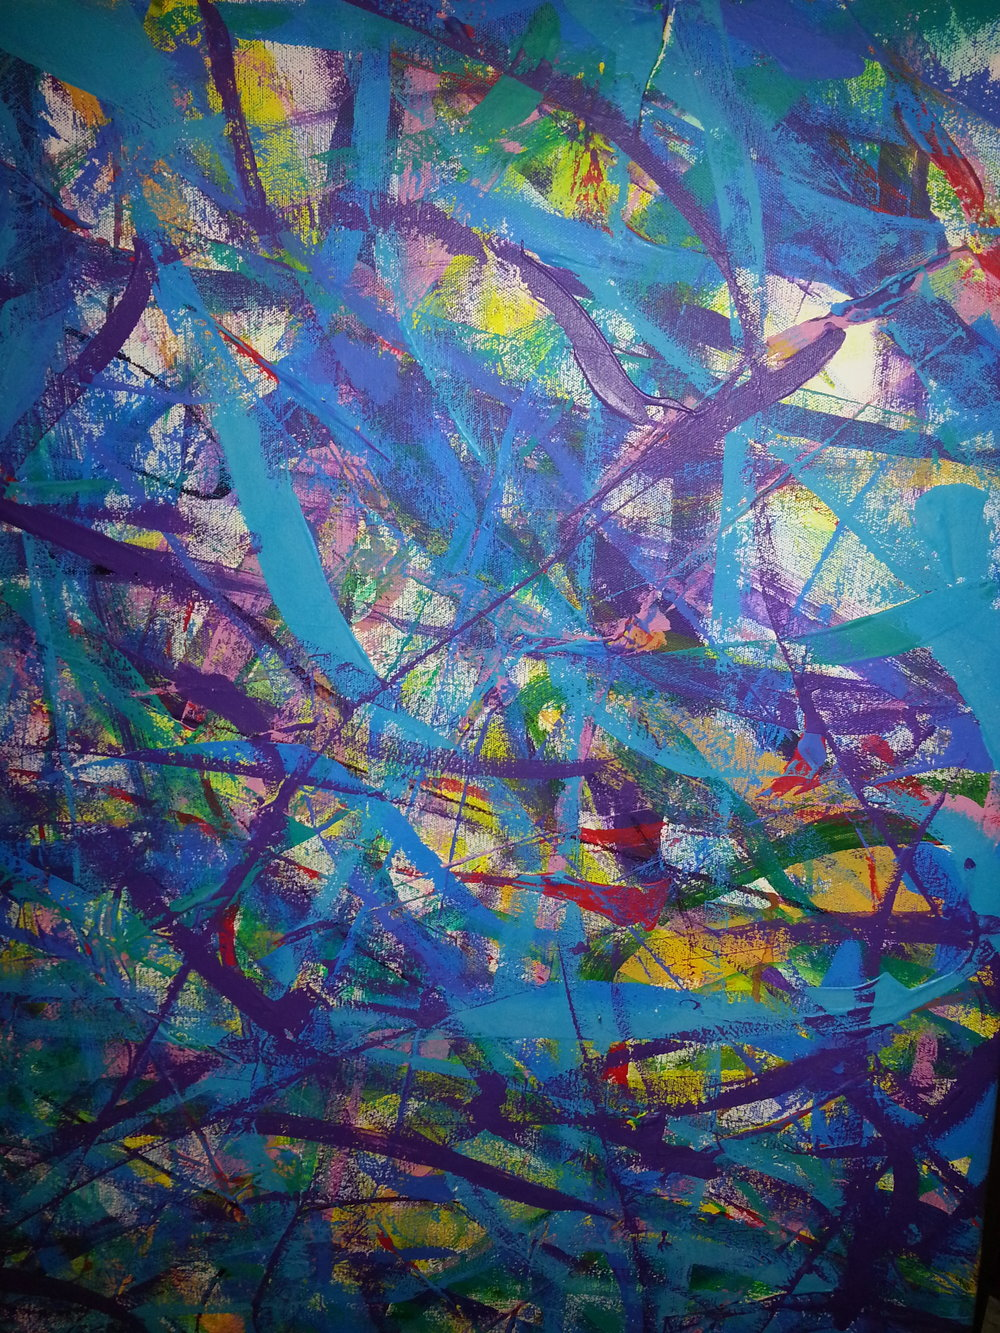 Bryan B. abstract blue and purple.jpg